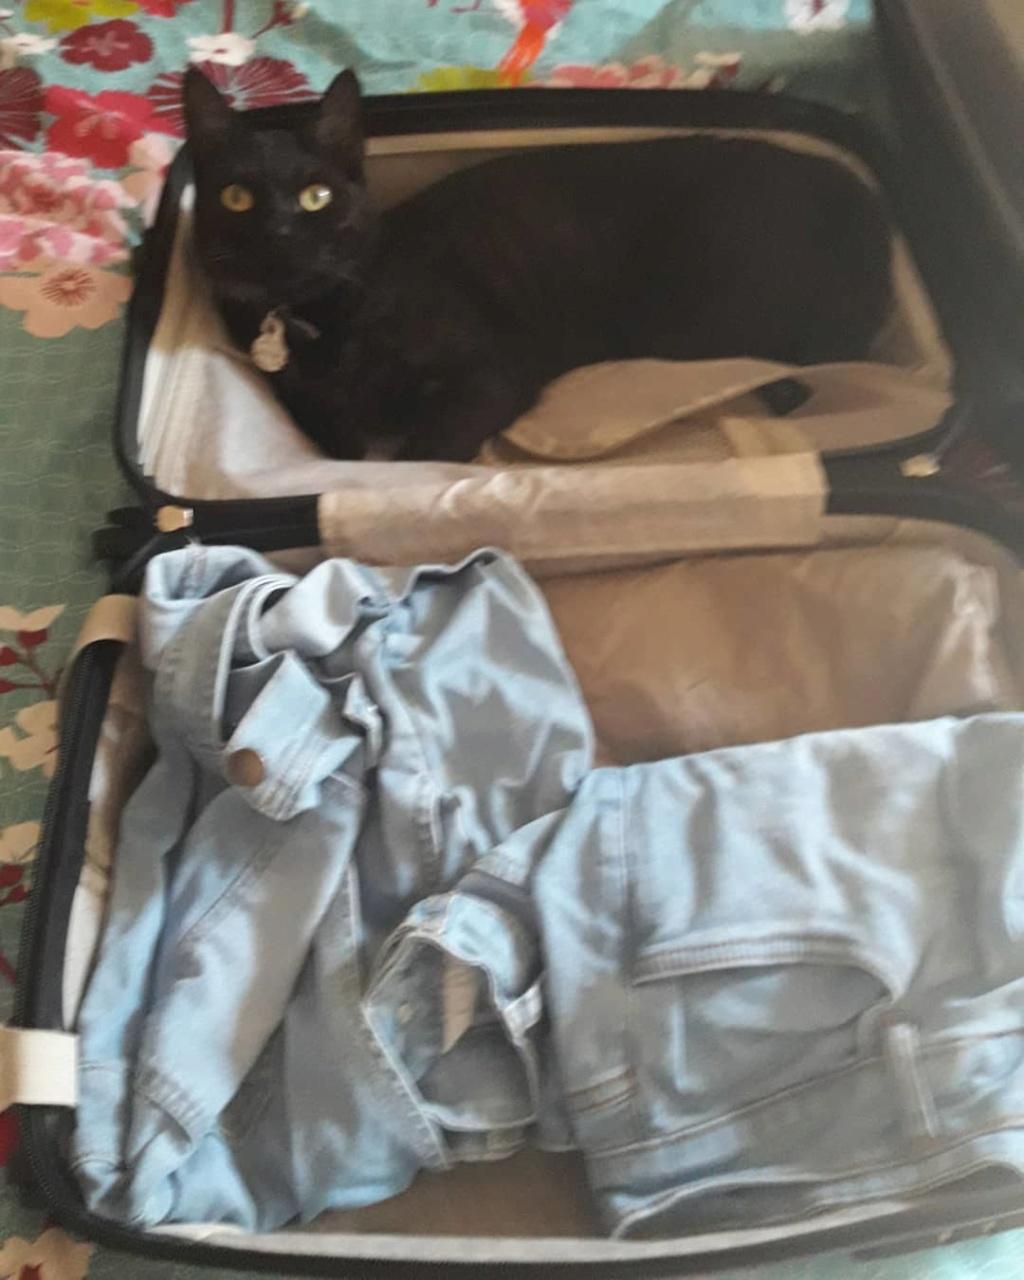 Dans ma valise il y a... - Page 7 36351910